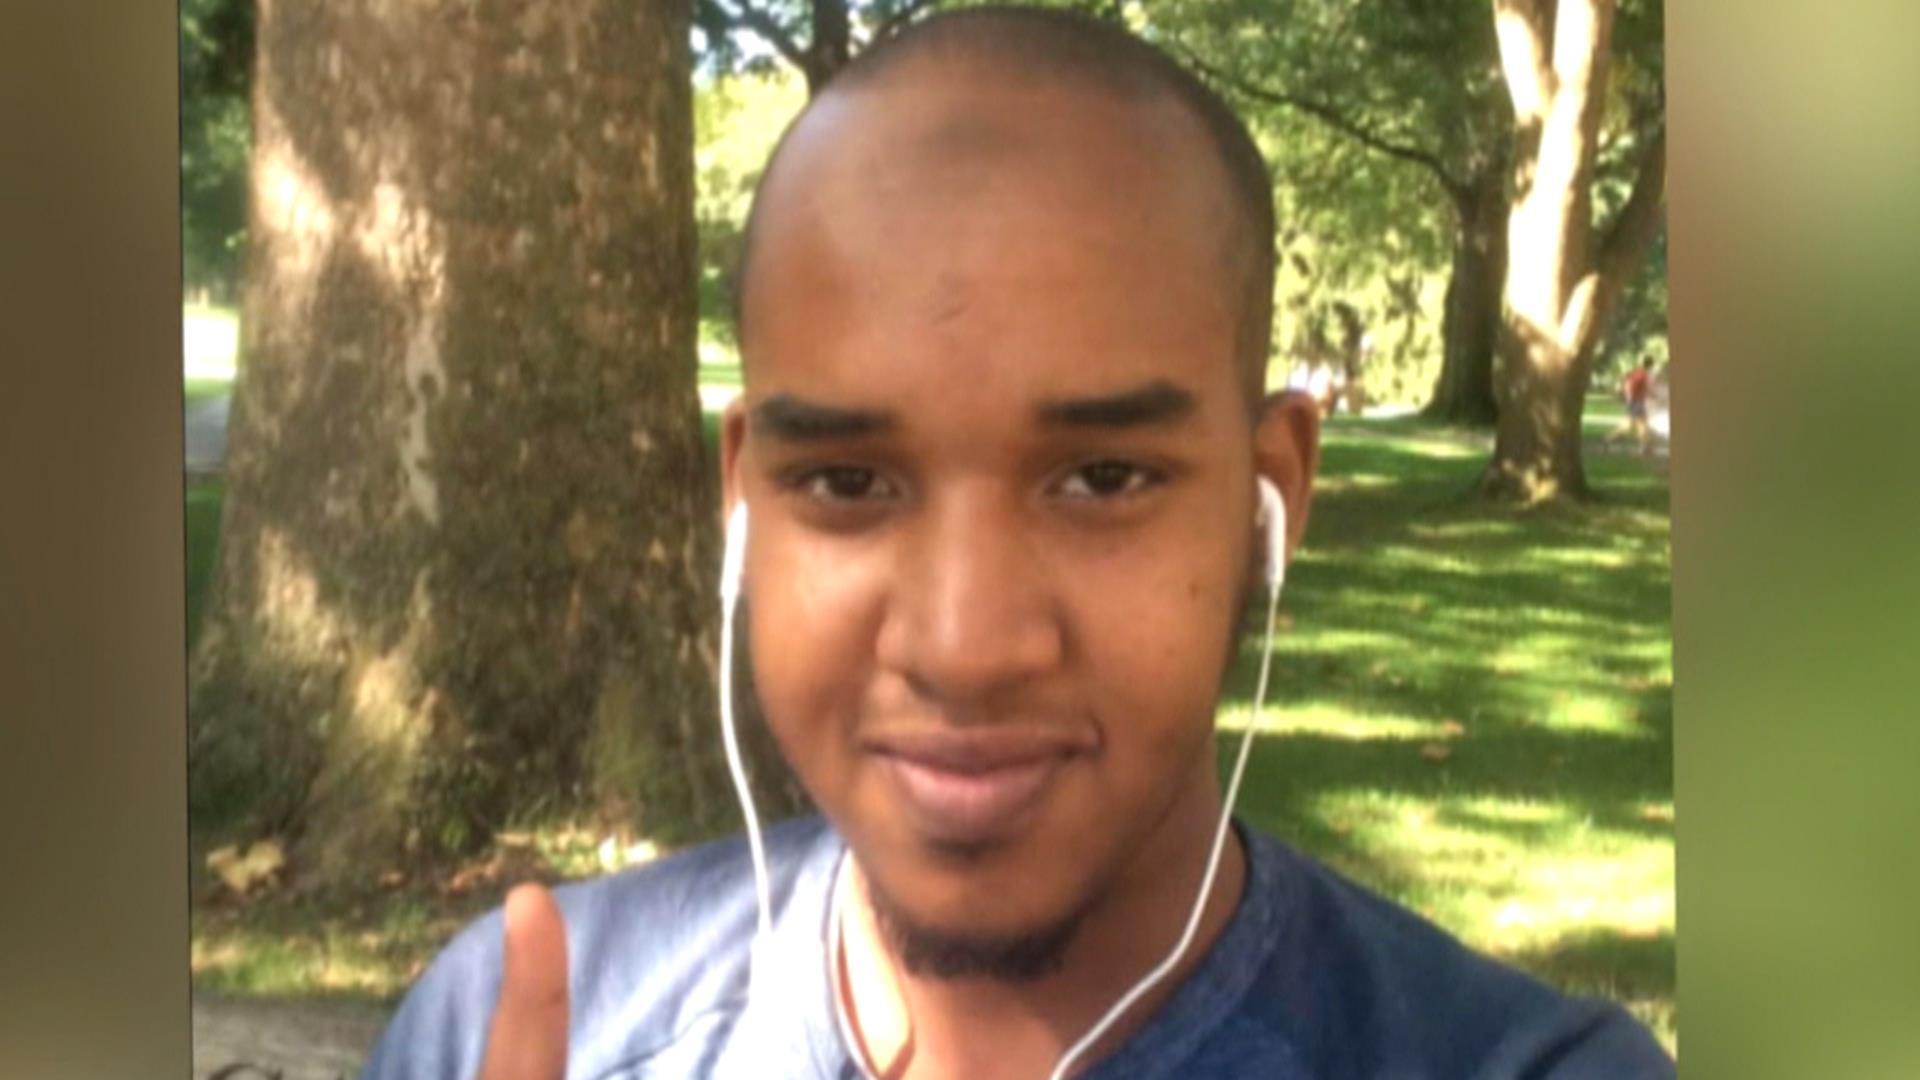 Suspect Identified in Ohio State Attack as Abdul Razak Ali Artan